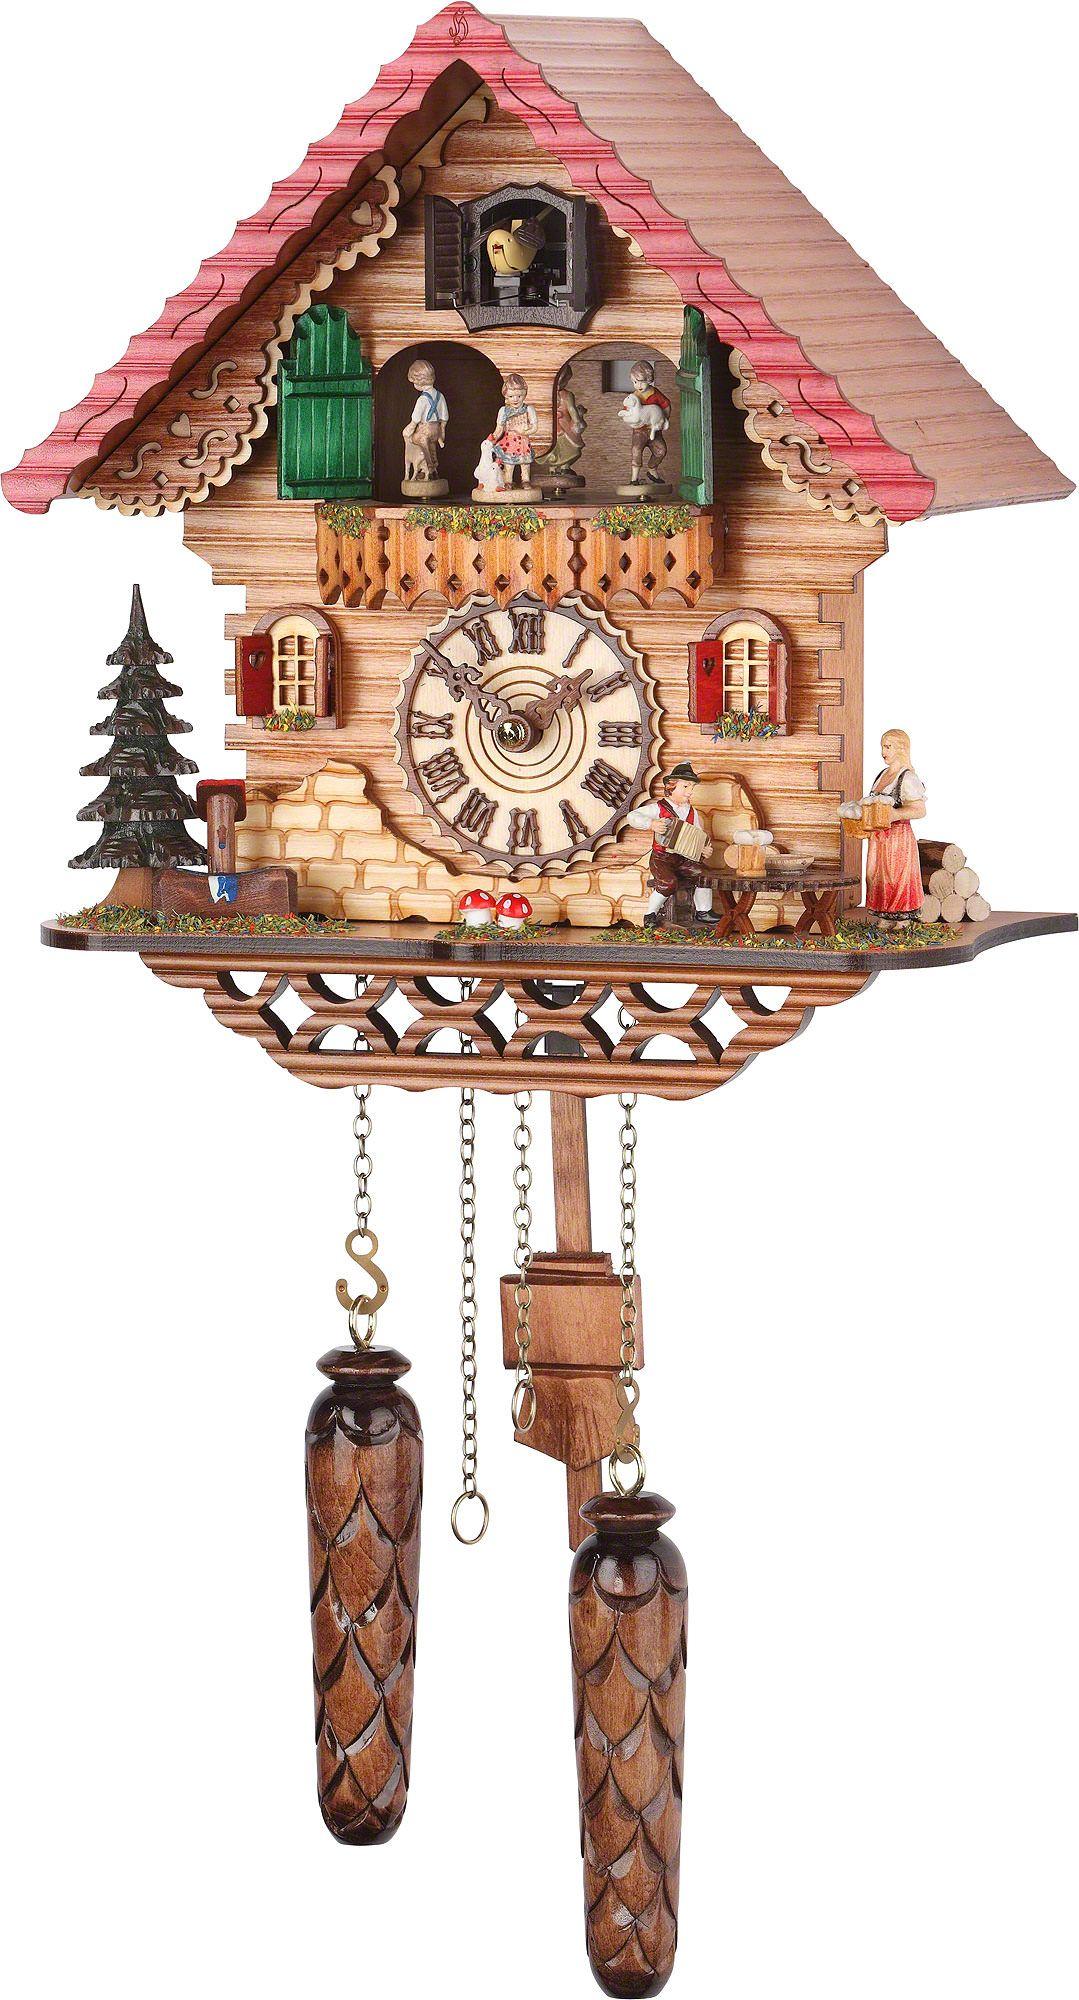 Cuckoo Clock Quartz Movement Chalet Style 29cm By Trenkle Uhren